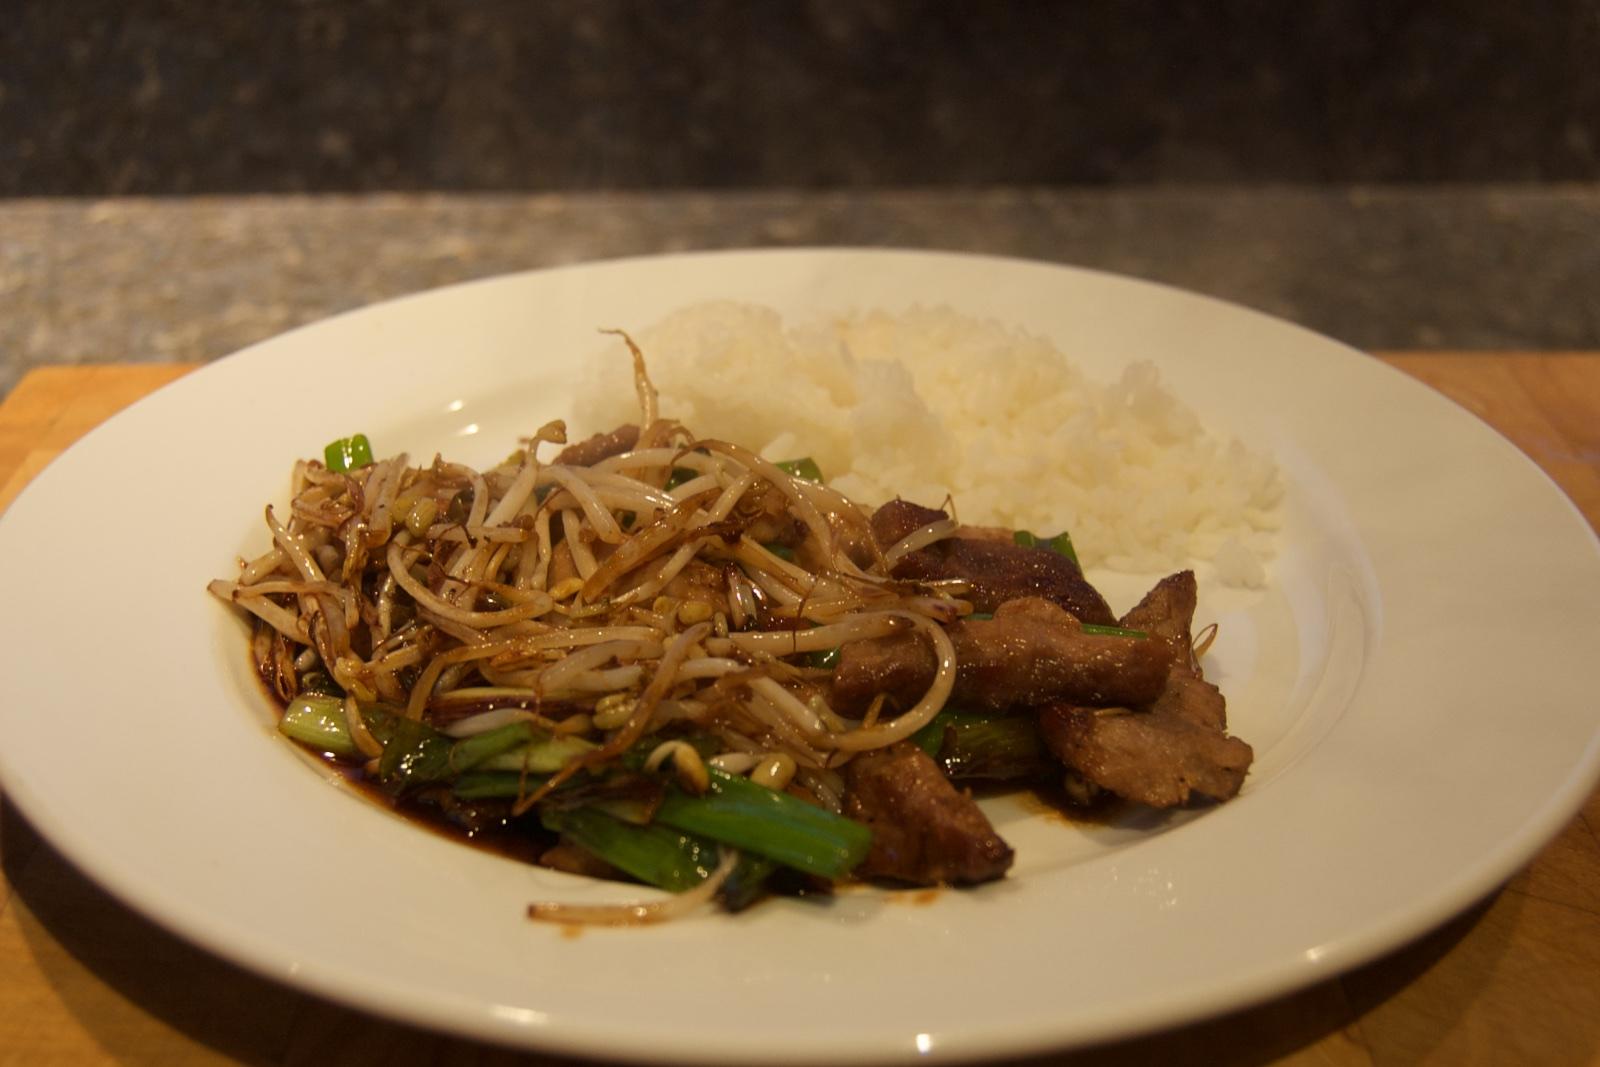 http://blog.rickk.com/food/2015/12/27/ate.2015.12.27.d.jpg